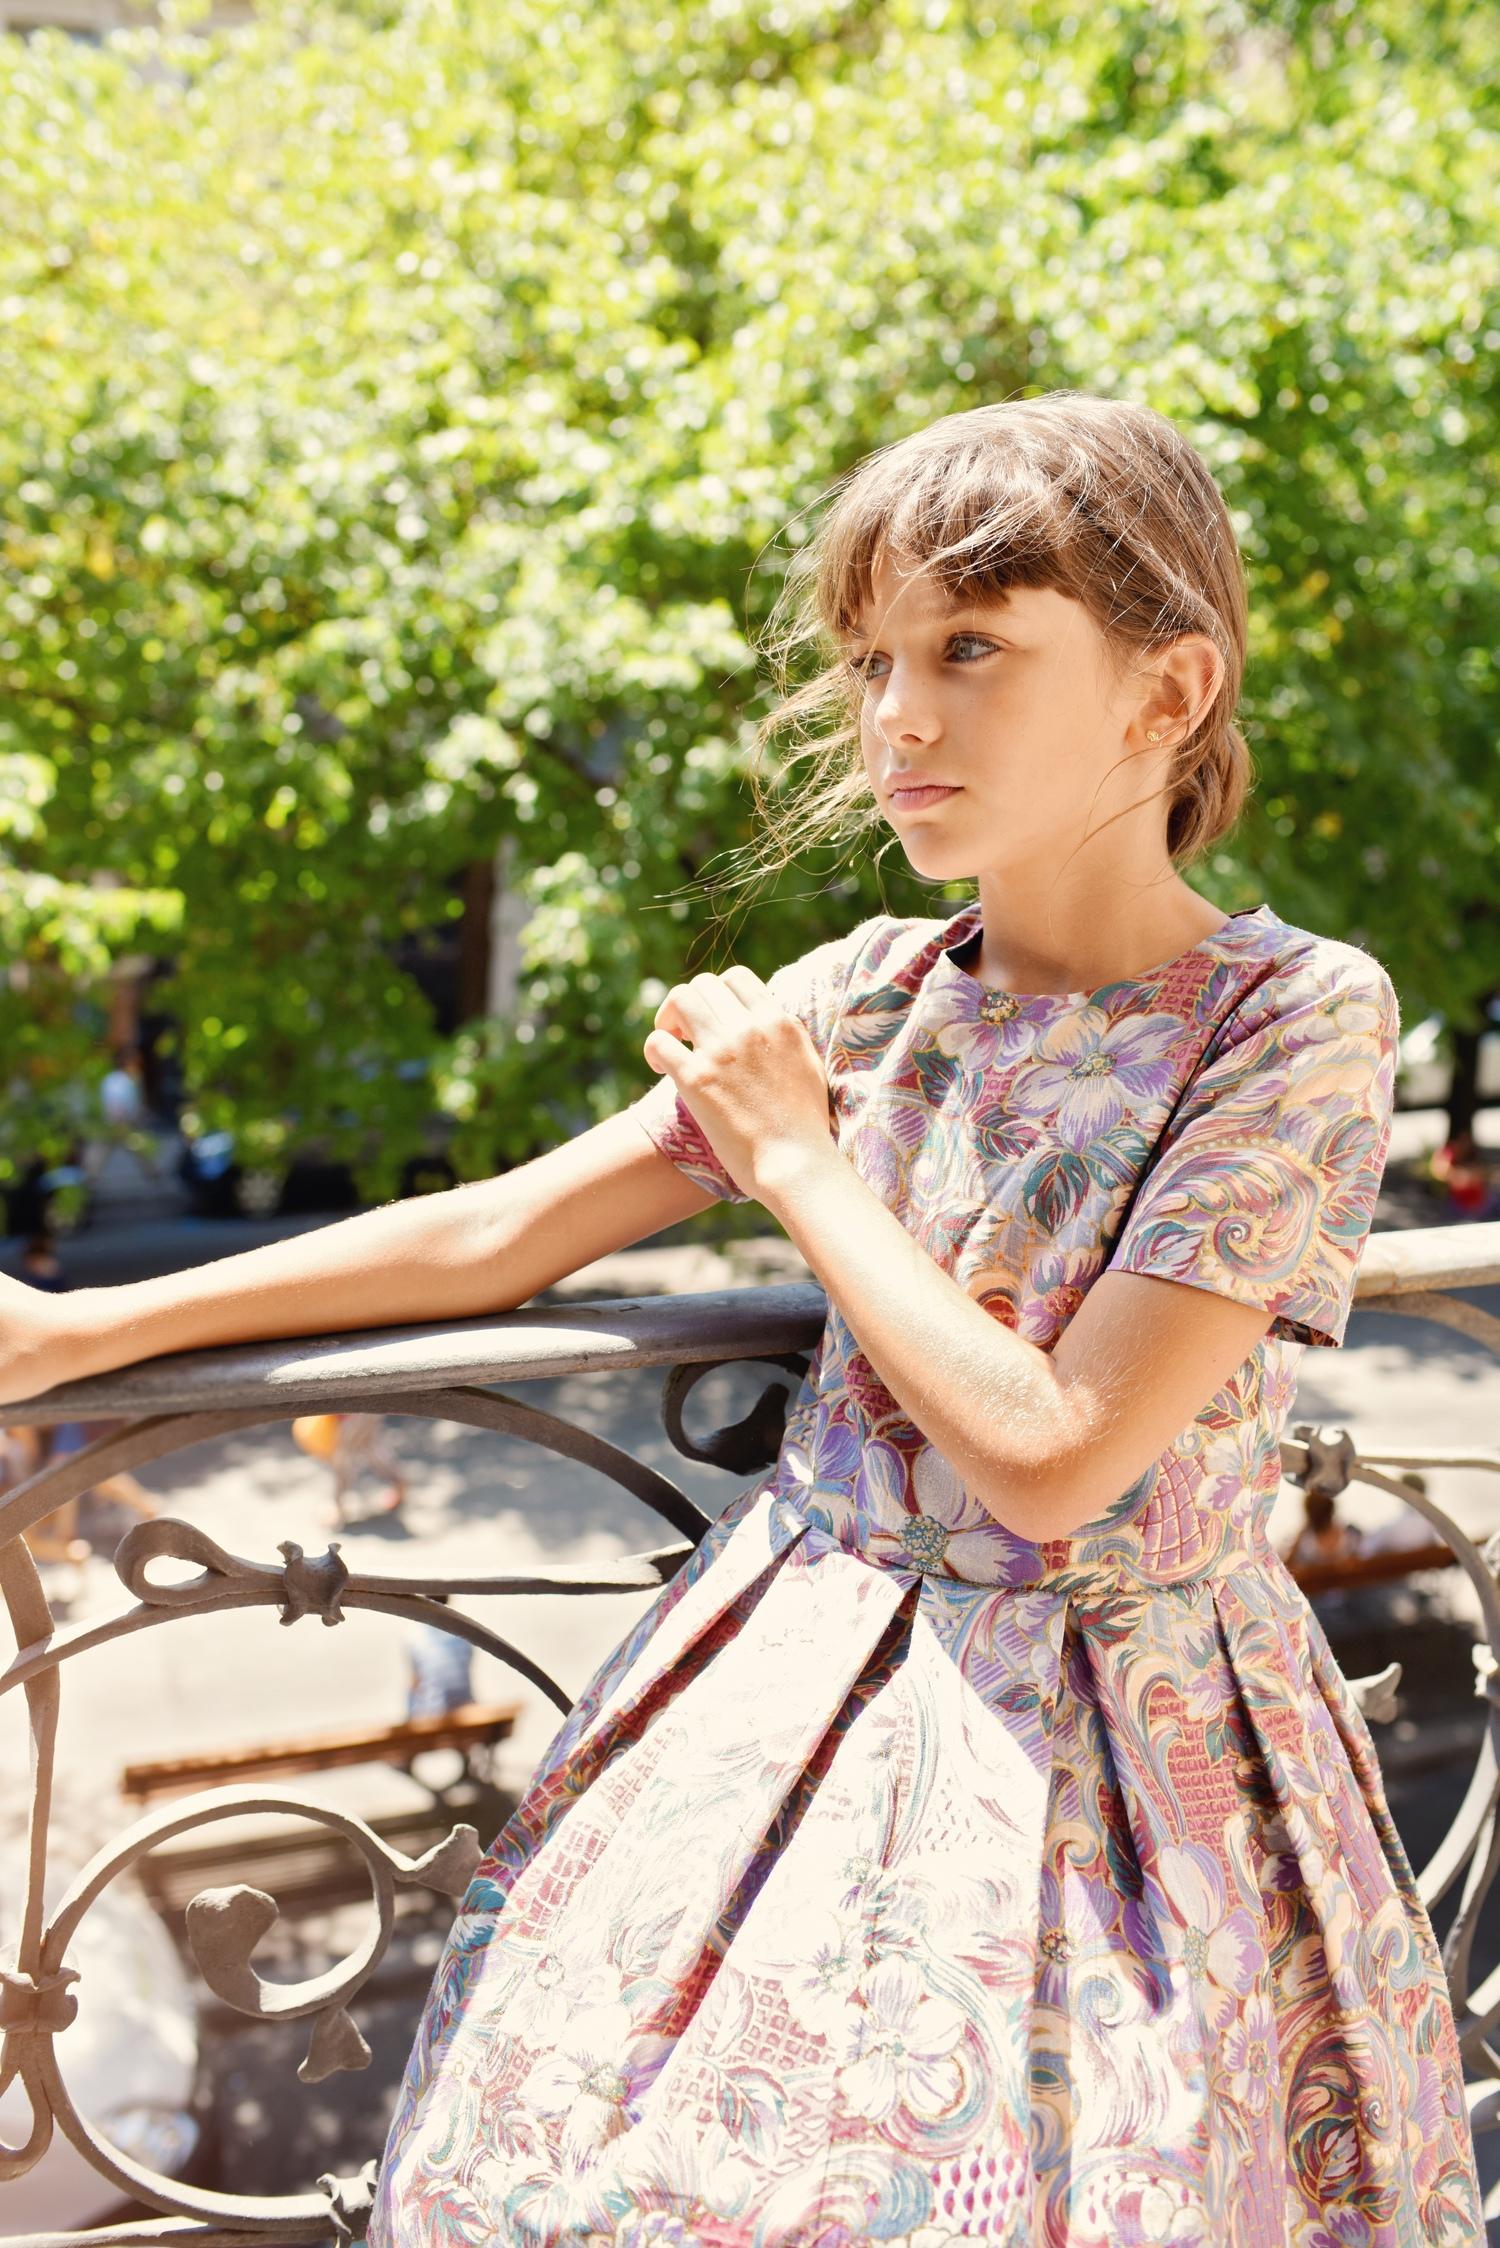 Enfant+Street+Style+by+Gina+Kim+Photography-16.jpeg